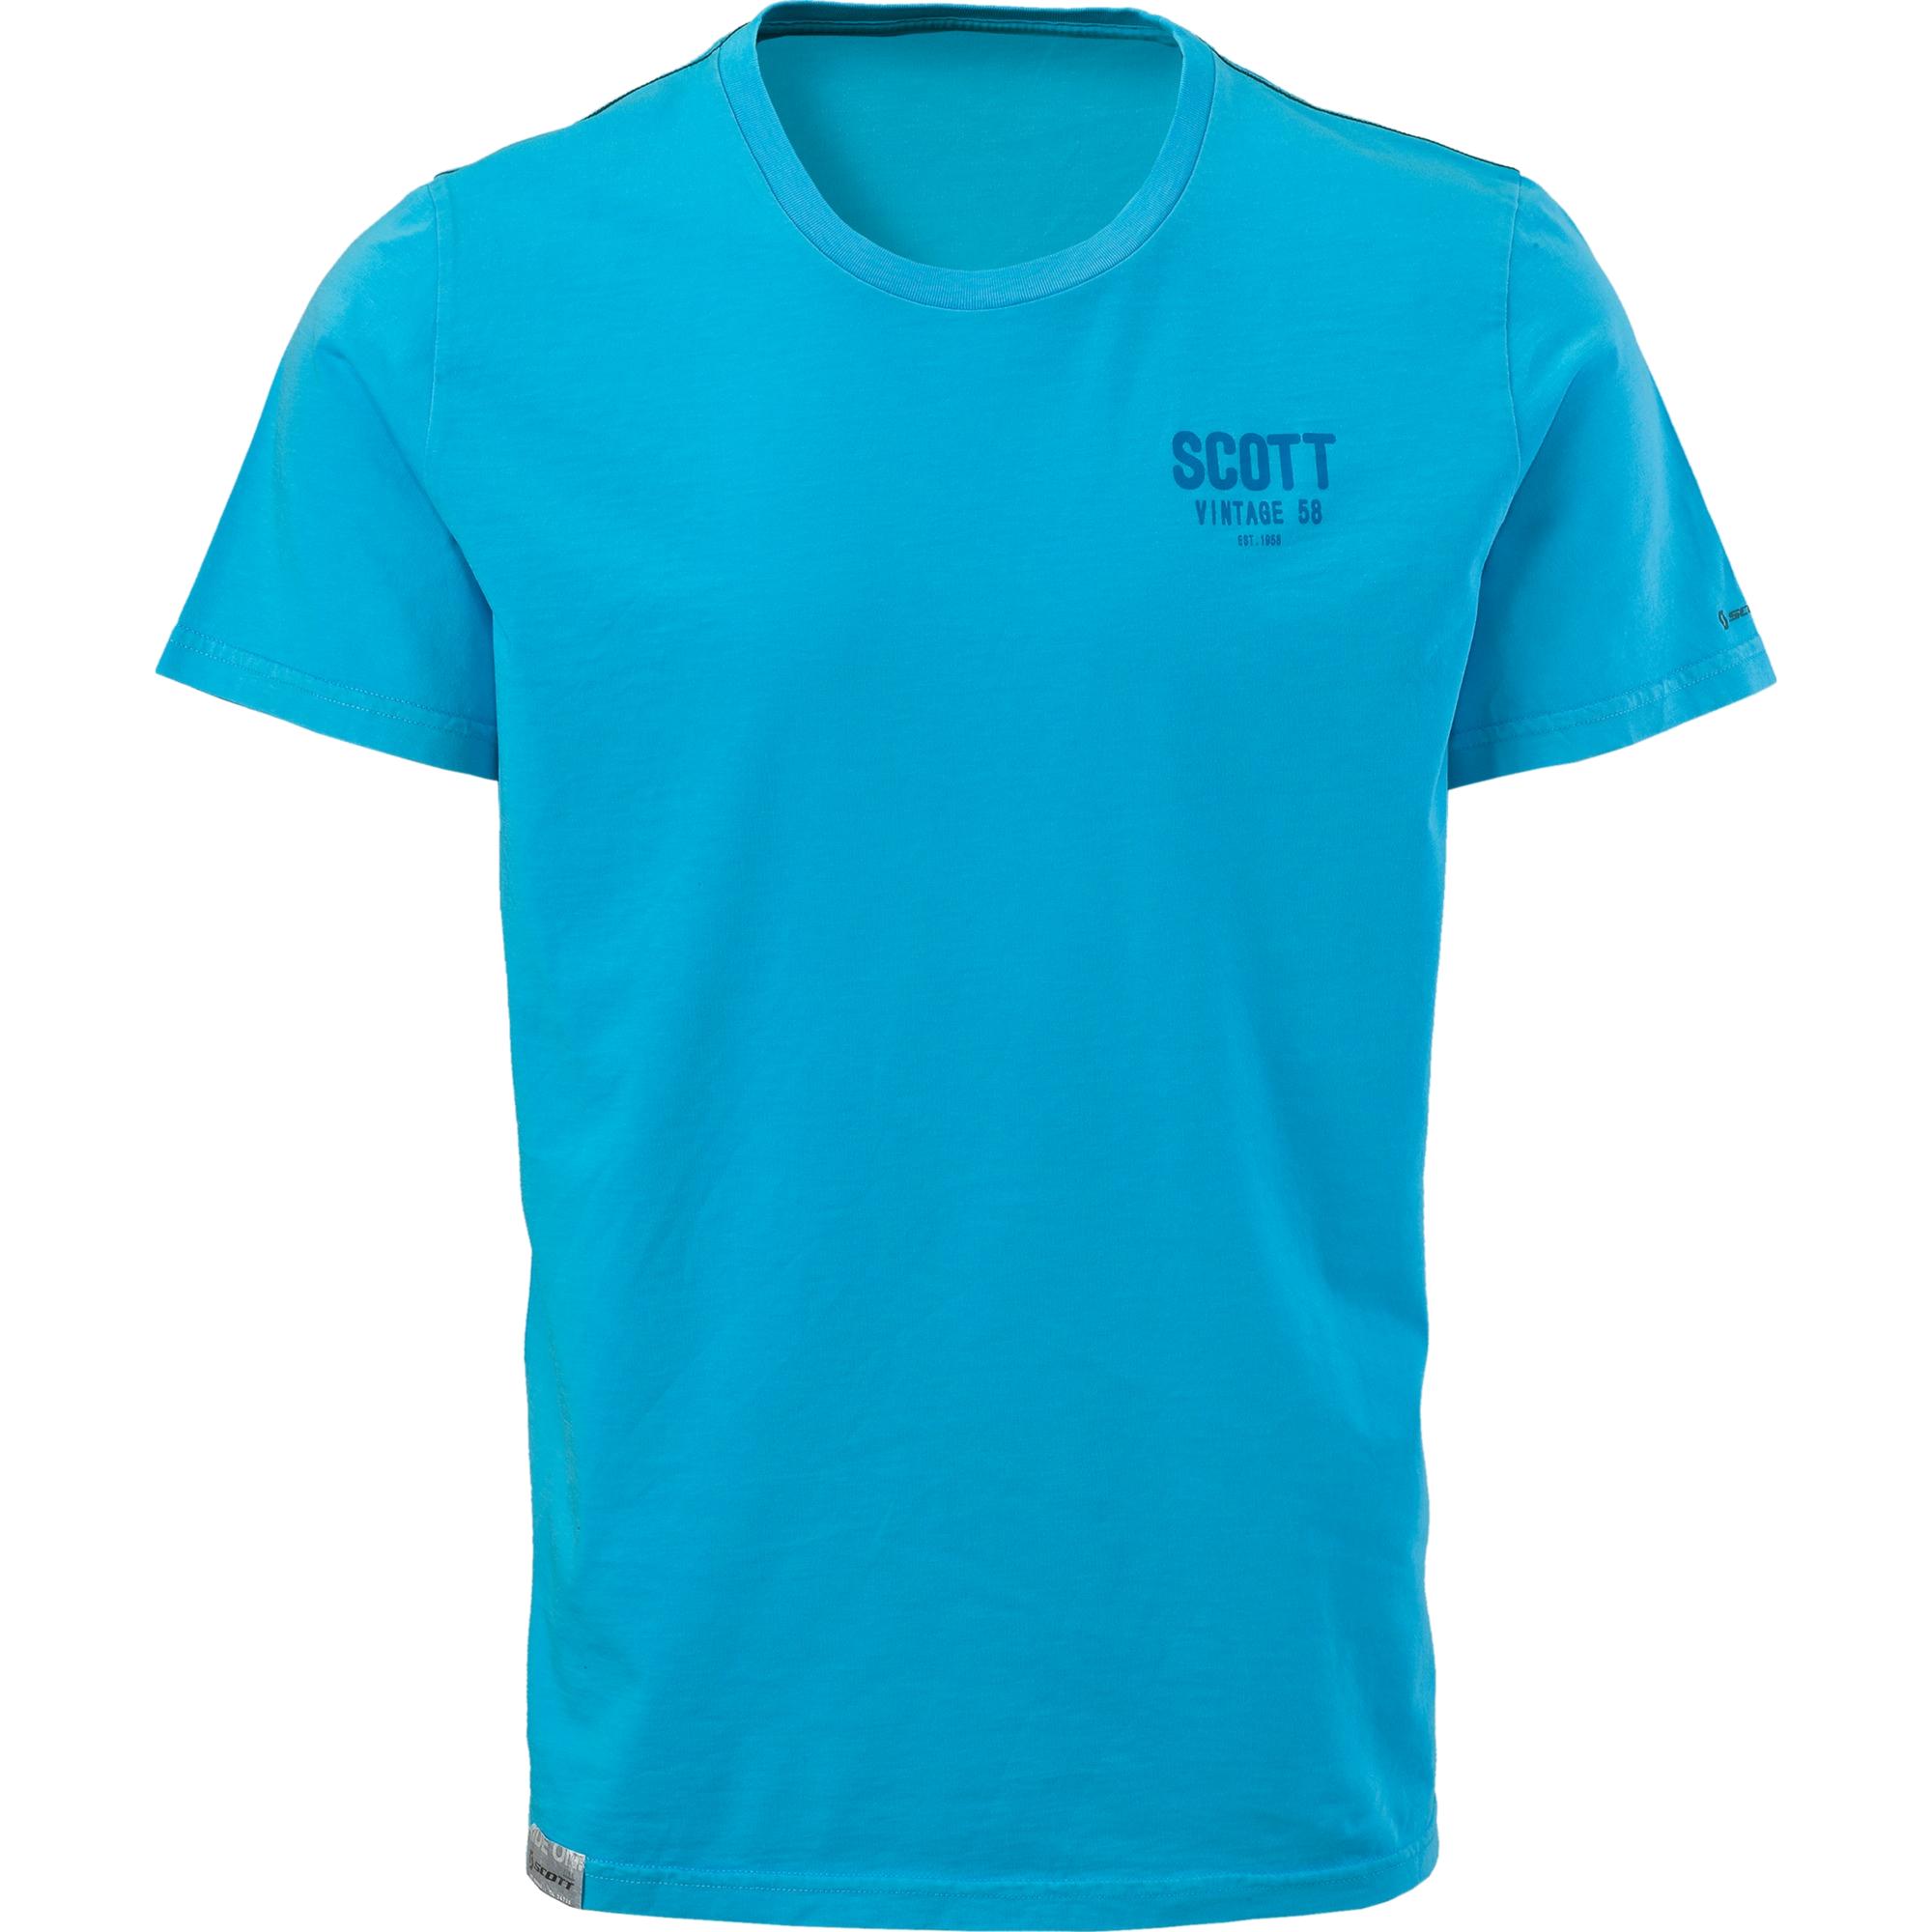 T-shirt PNG image - Blue Tshirt PNG